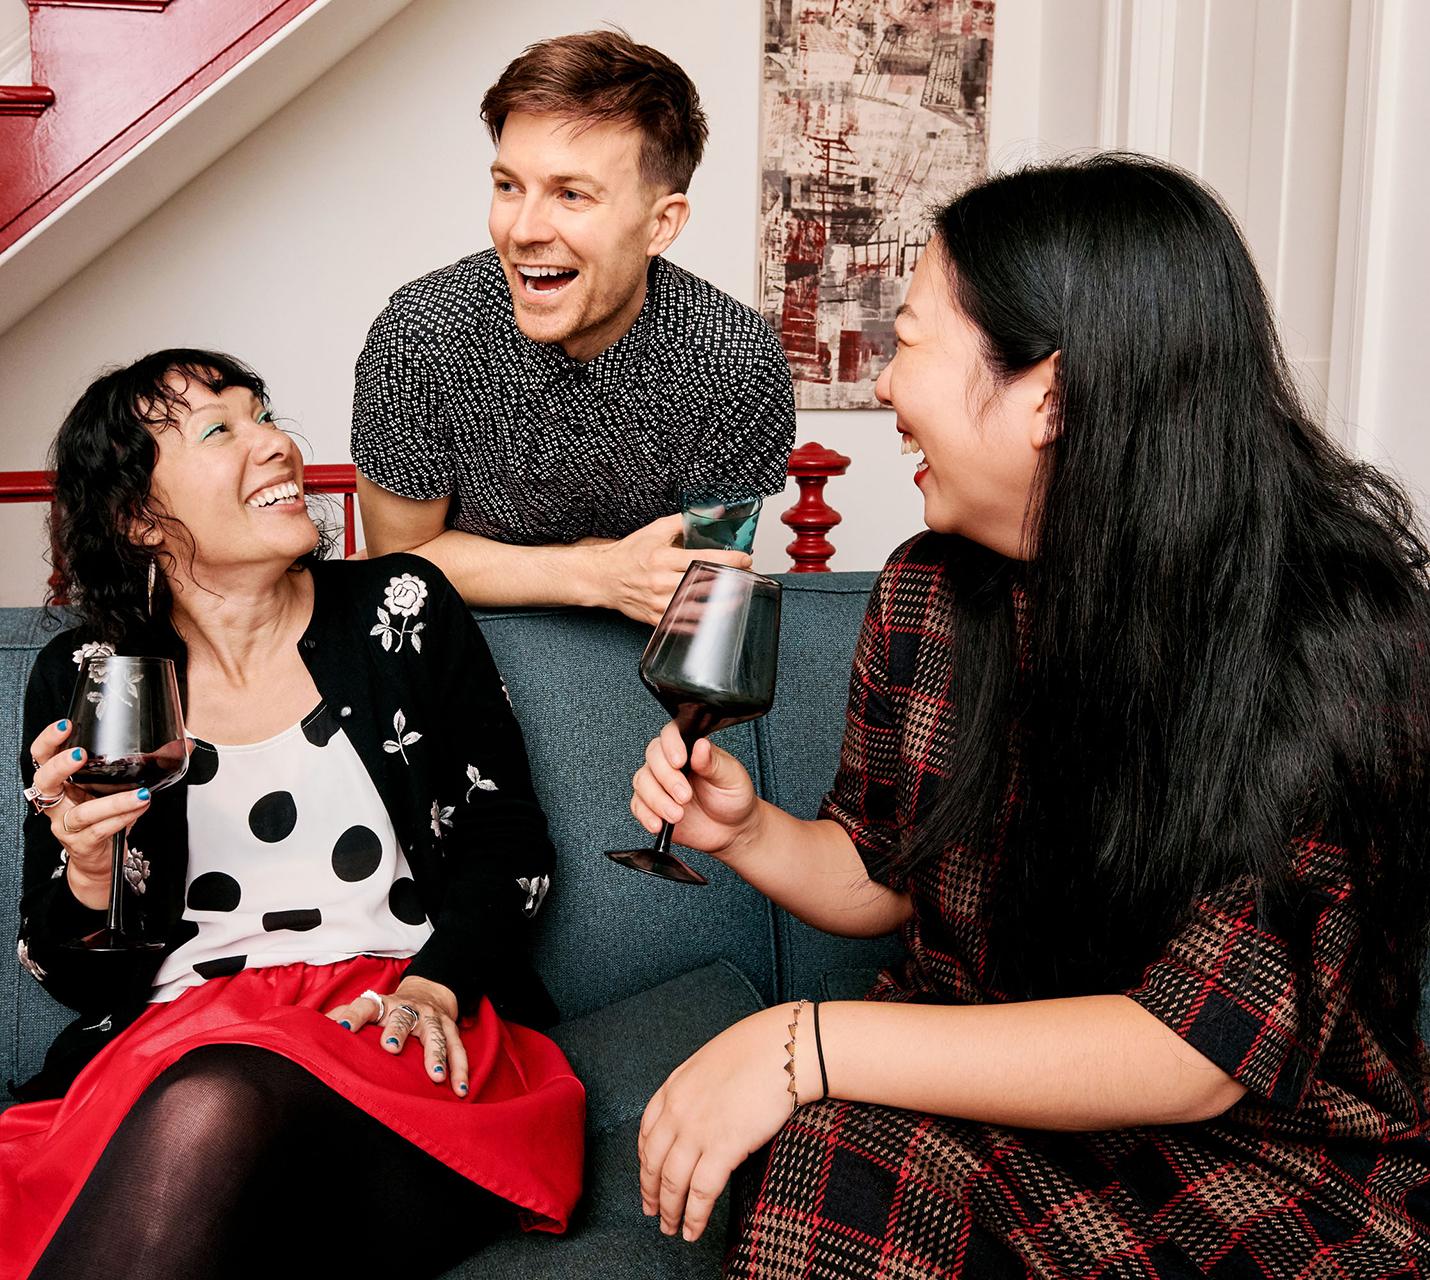 antoni's friends drinking wine